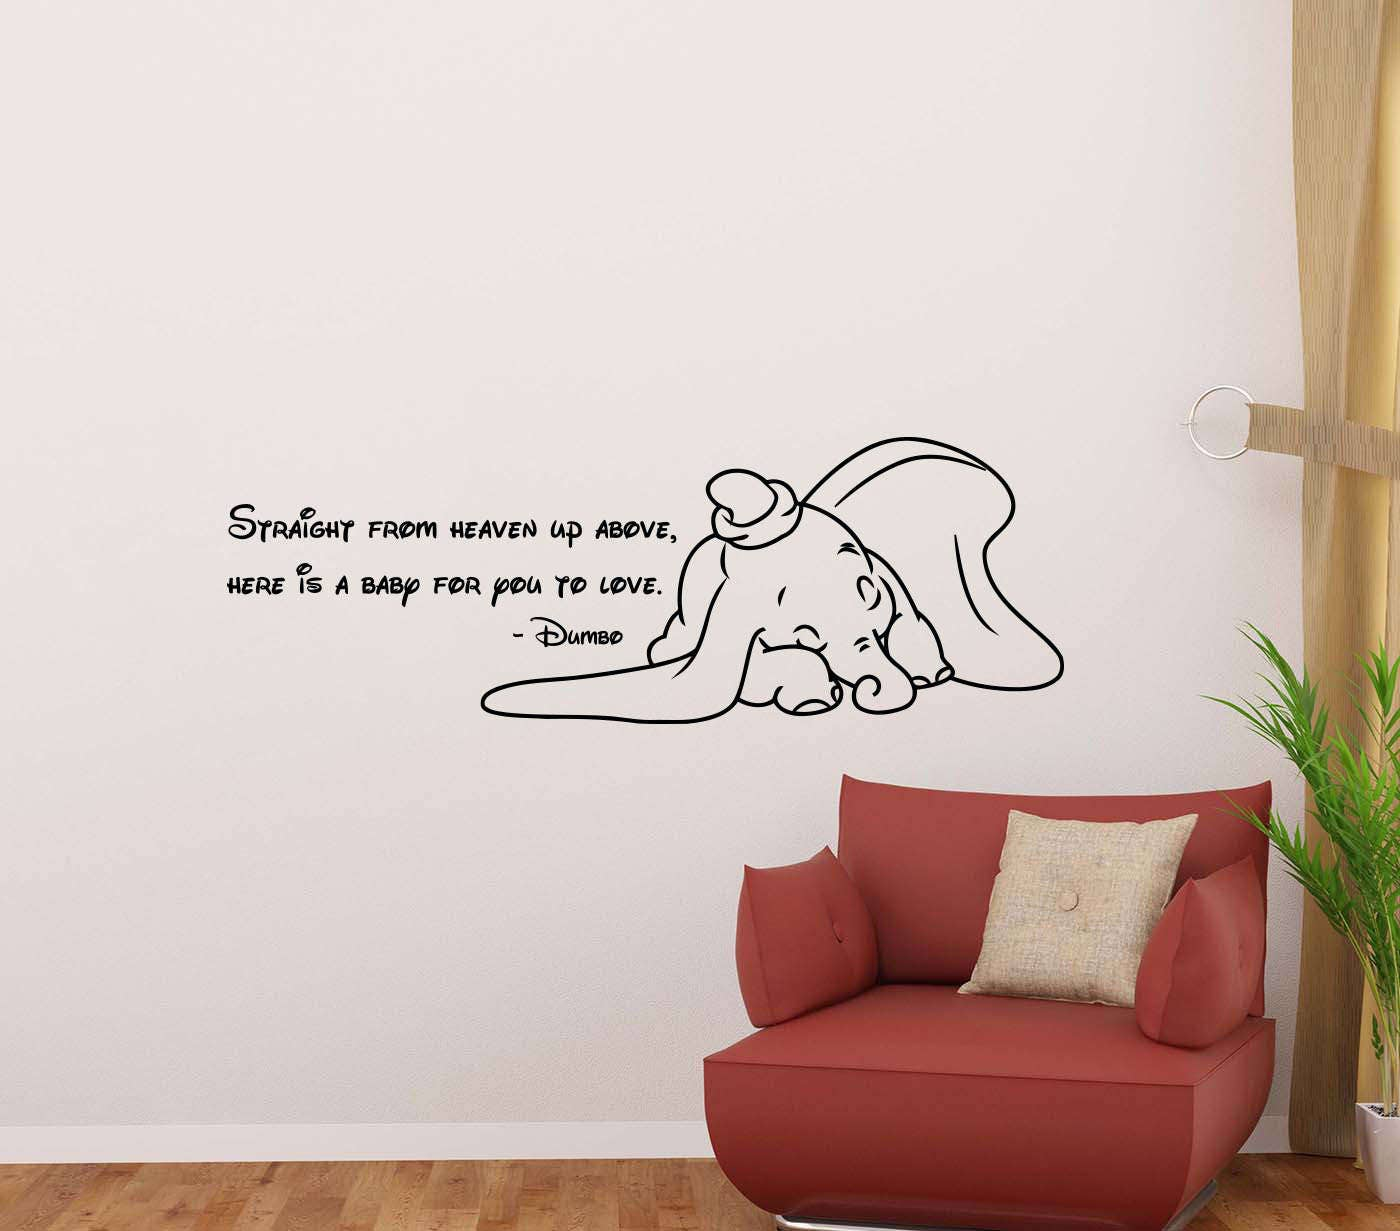 Dumbo Zitat Wandtattoo direkt vom Himmel Walt Disney